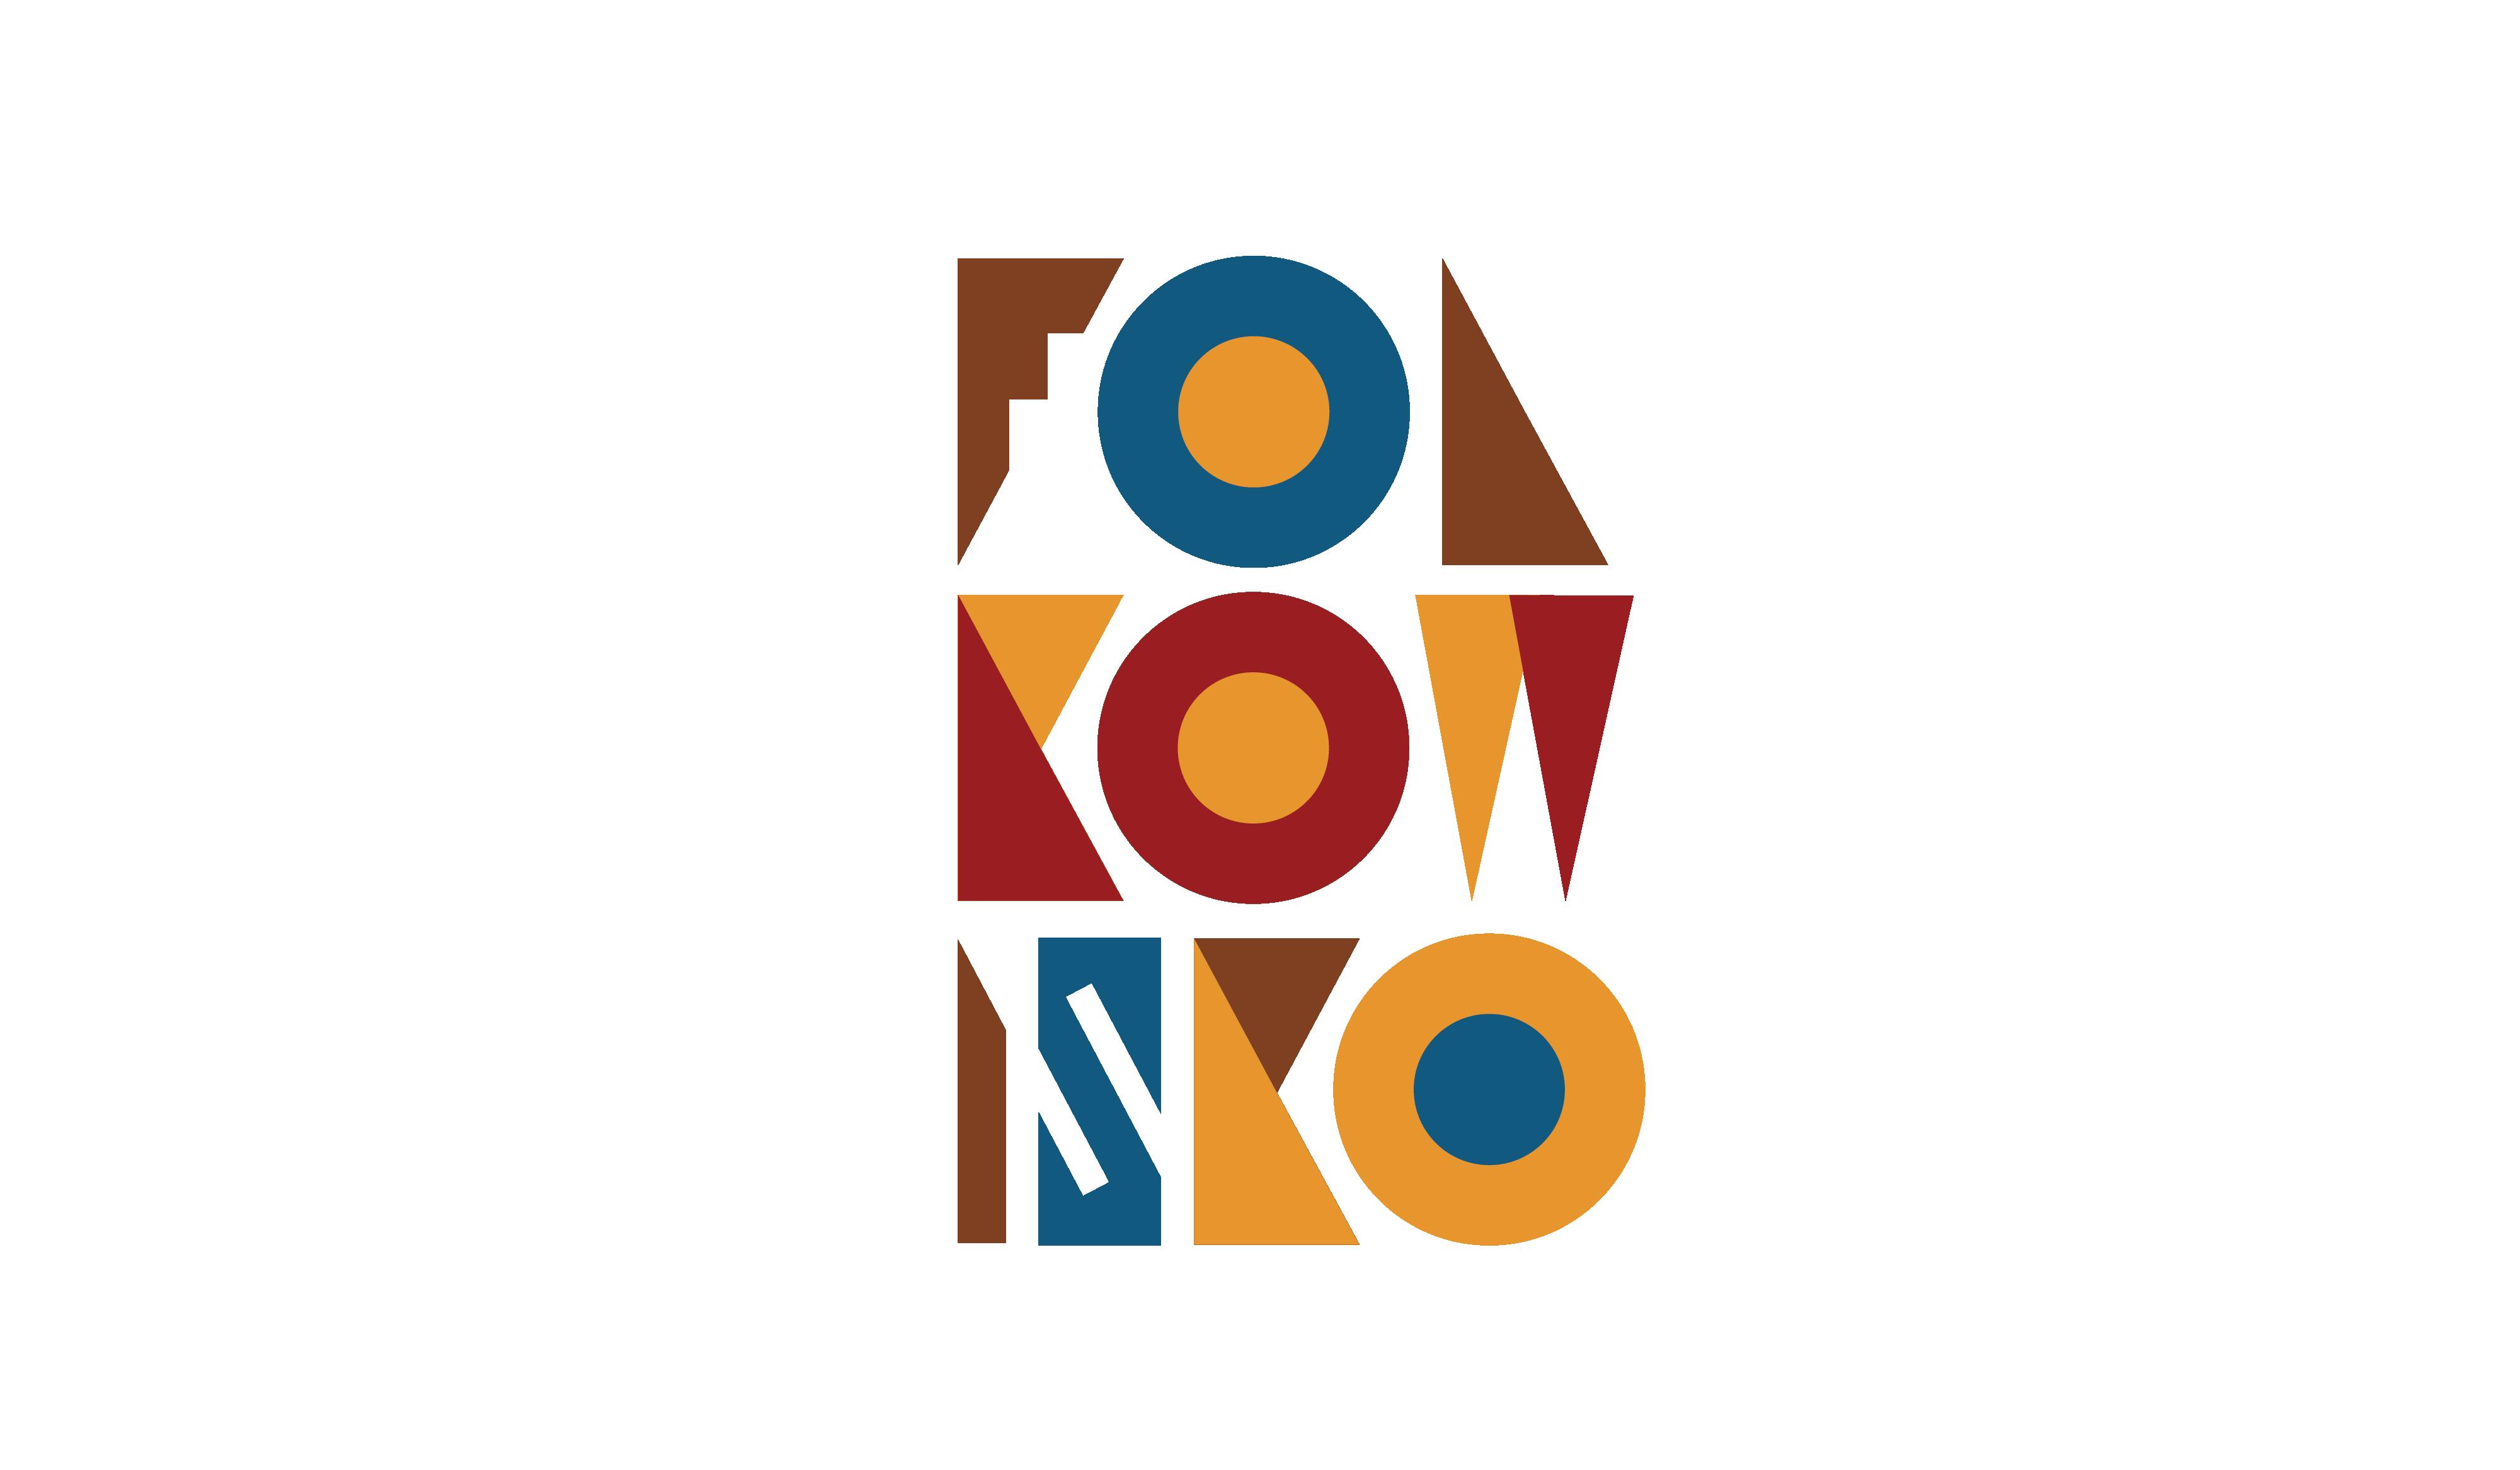 Festiwal Kultury Pogranicza Folkowisko